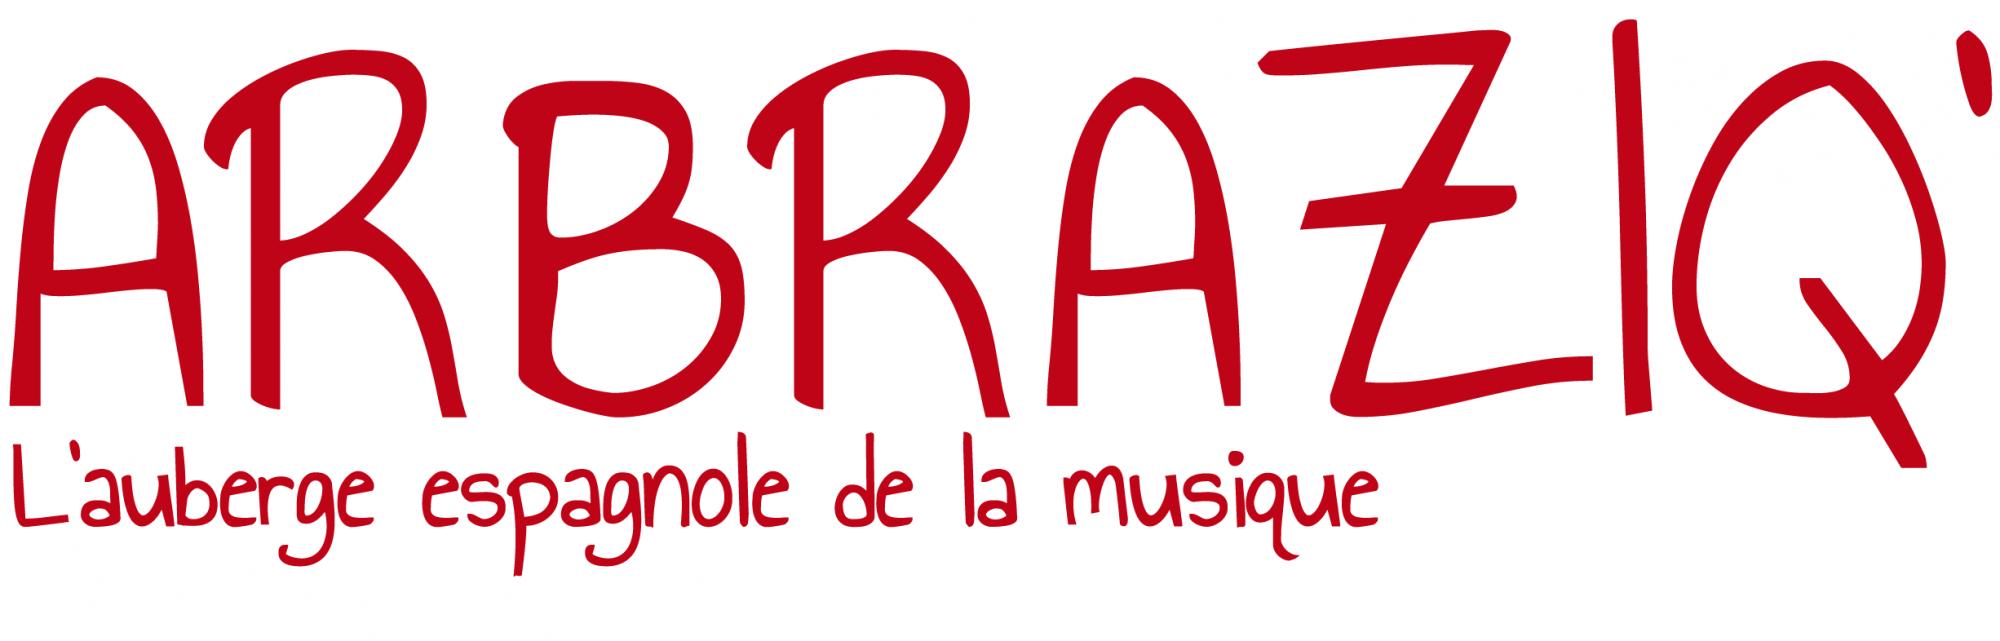 Arbraziq' l'auberge espagnole de la musique